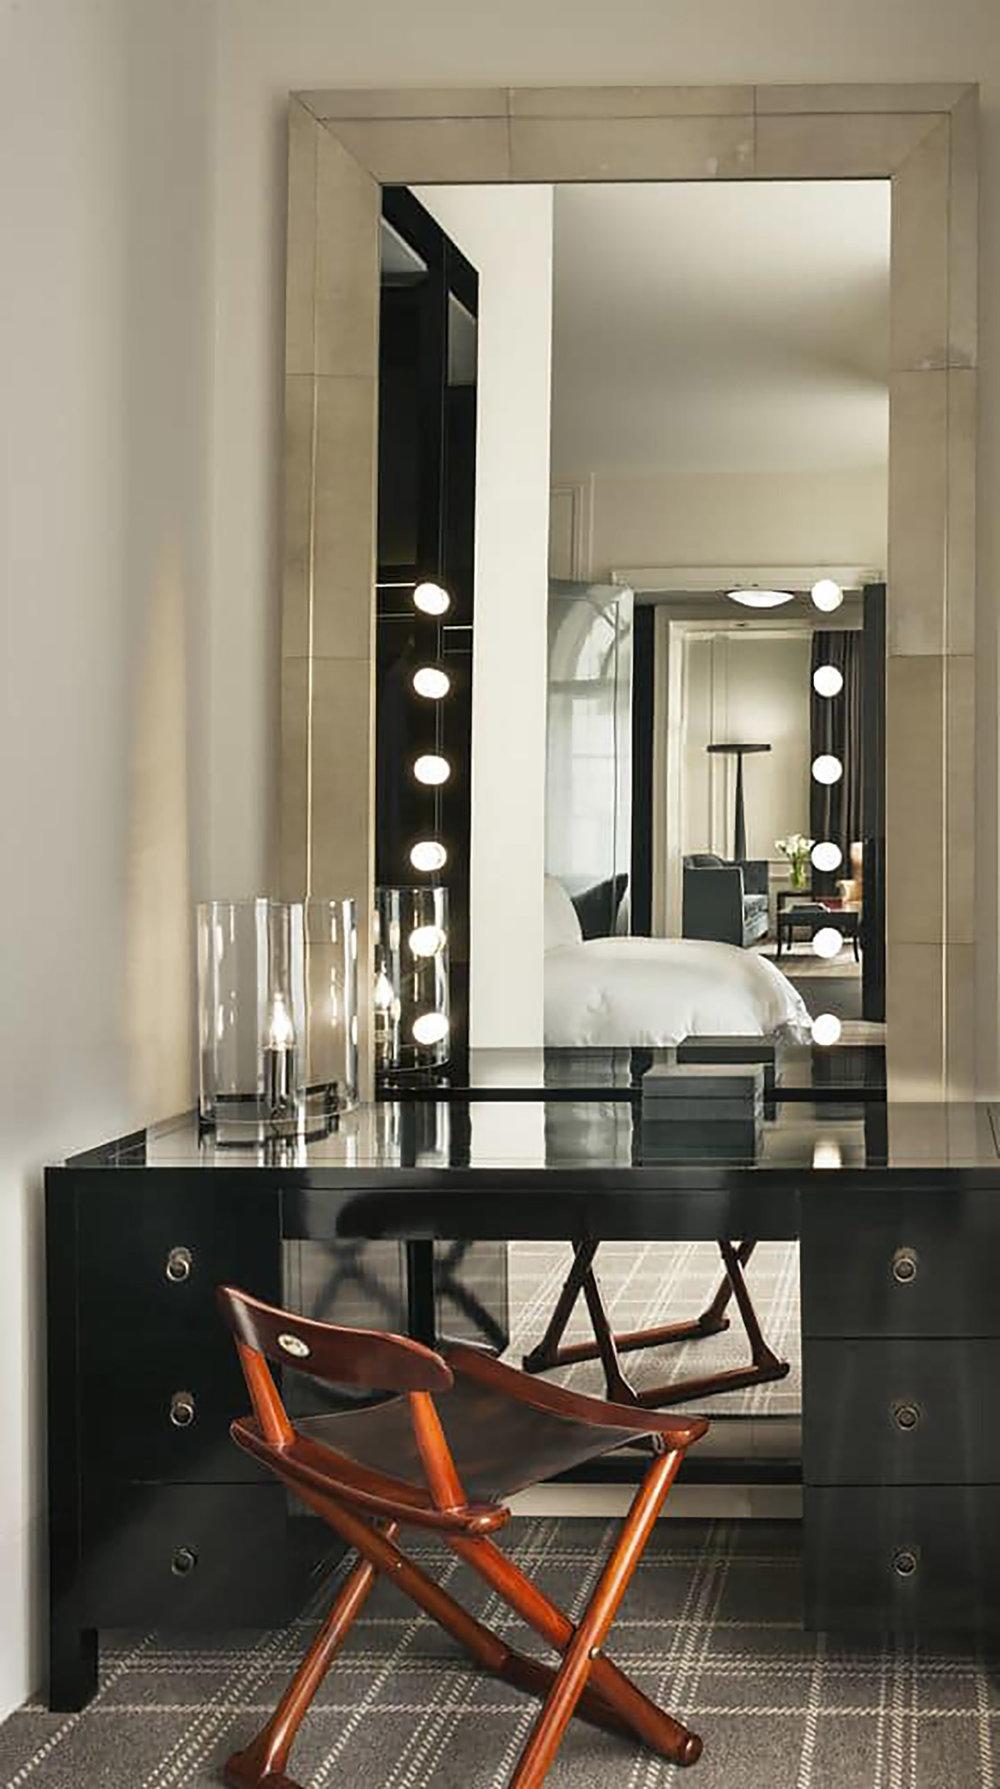 ....bespoke furniture | rosewood london : dressing table..特别定制家具 | 瑰丽伦敦酒店:梳妆台....